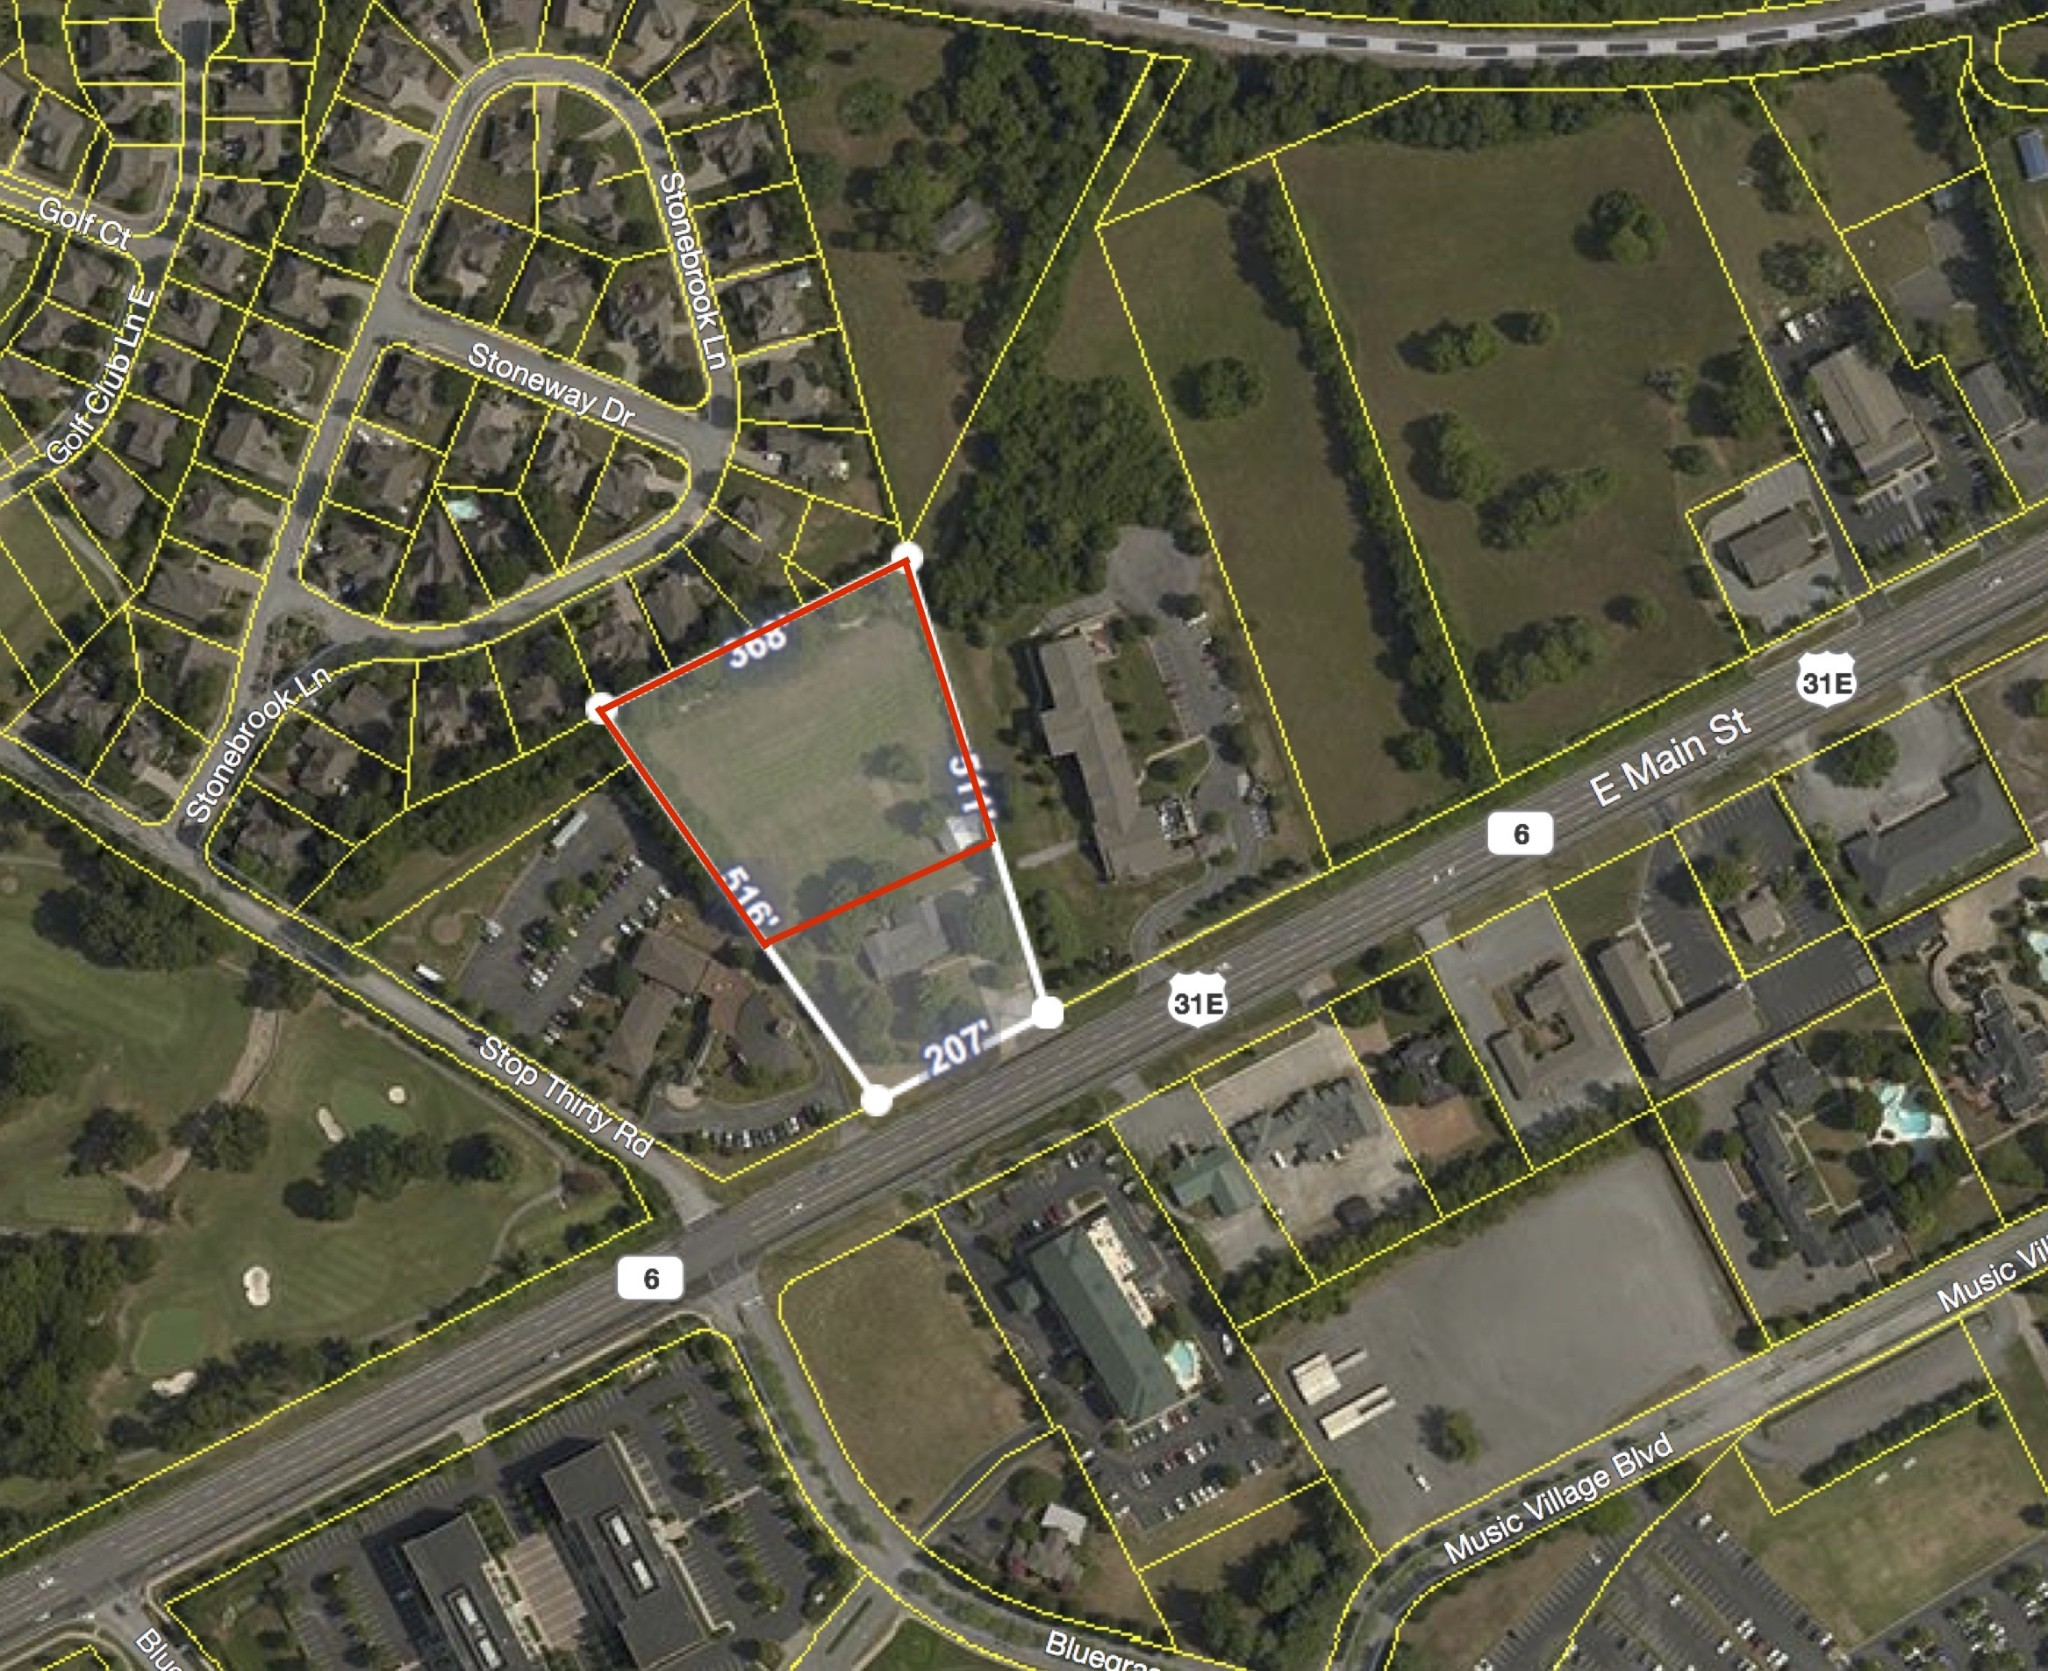 0 E Main Property Photo - Hendersonville, TN real estate listing